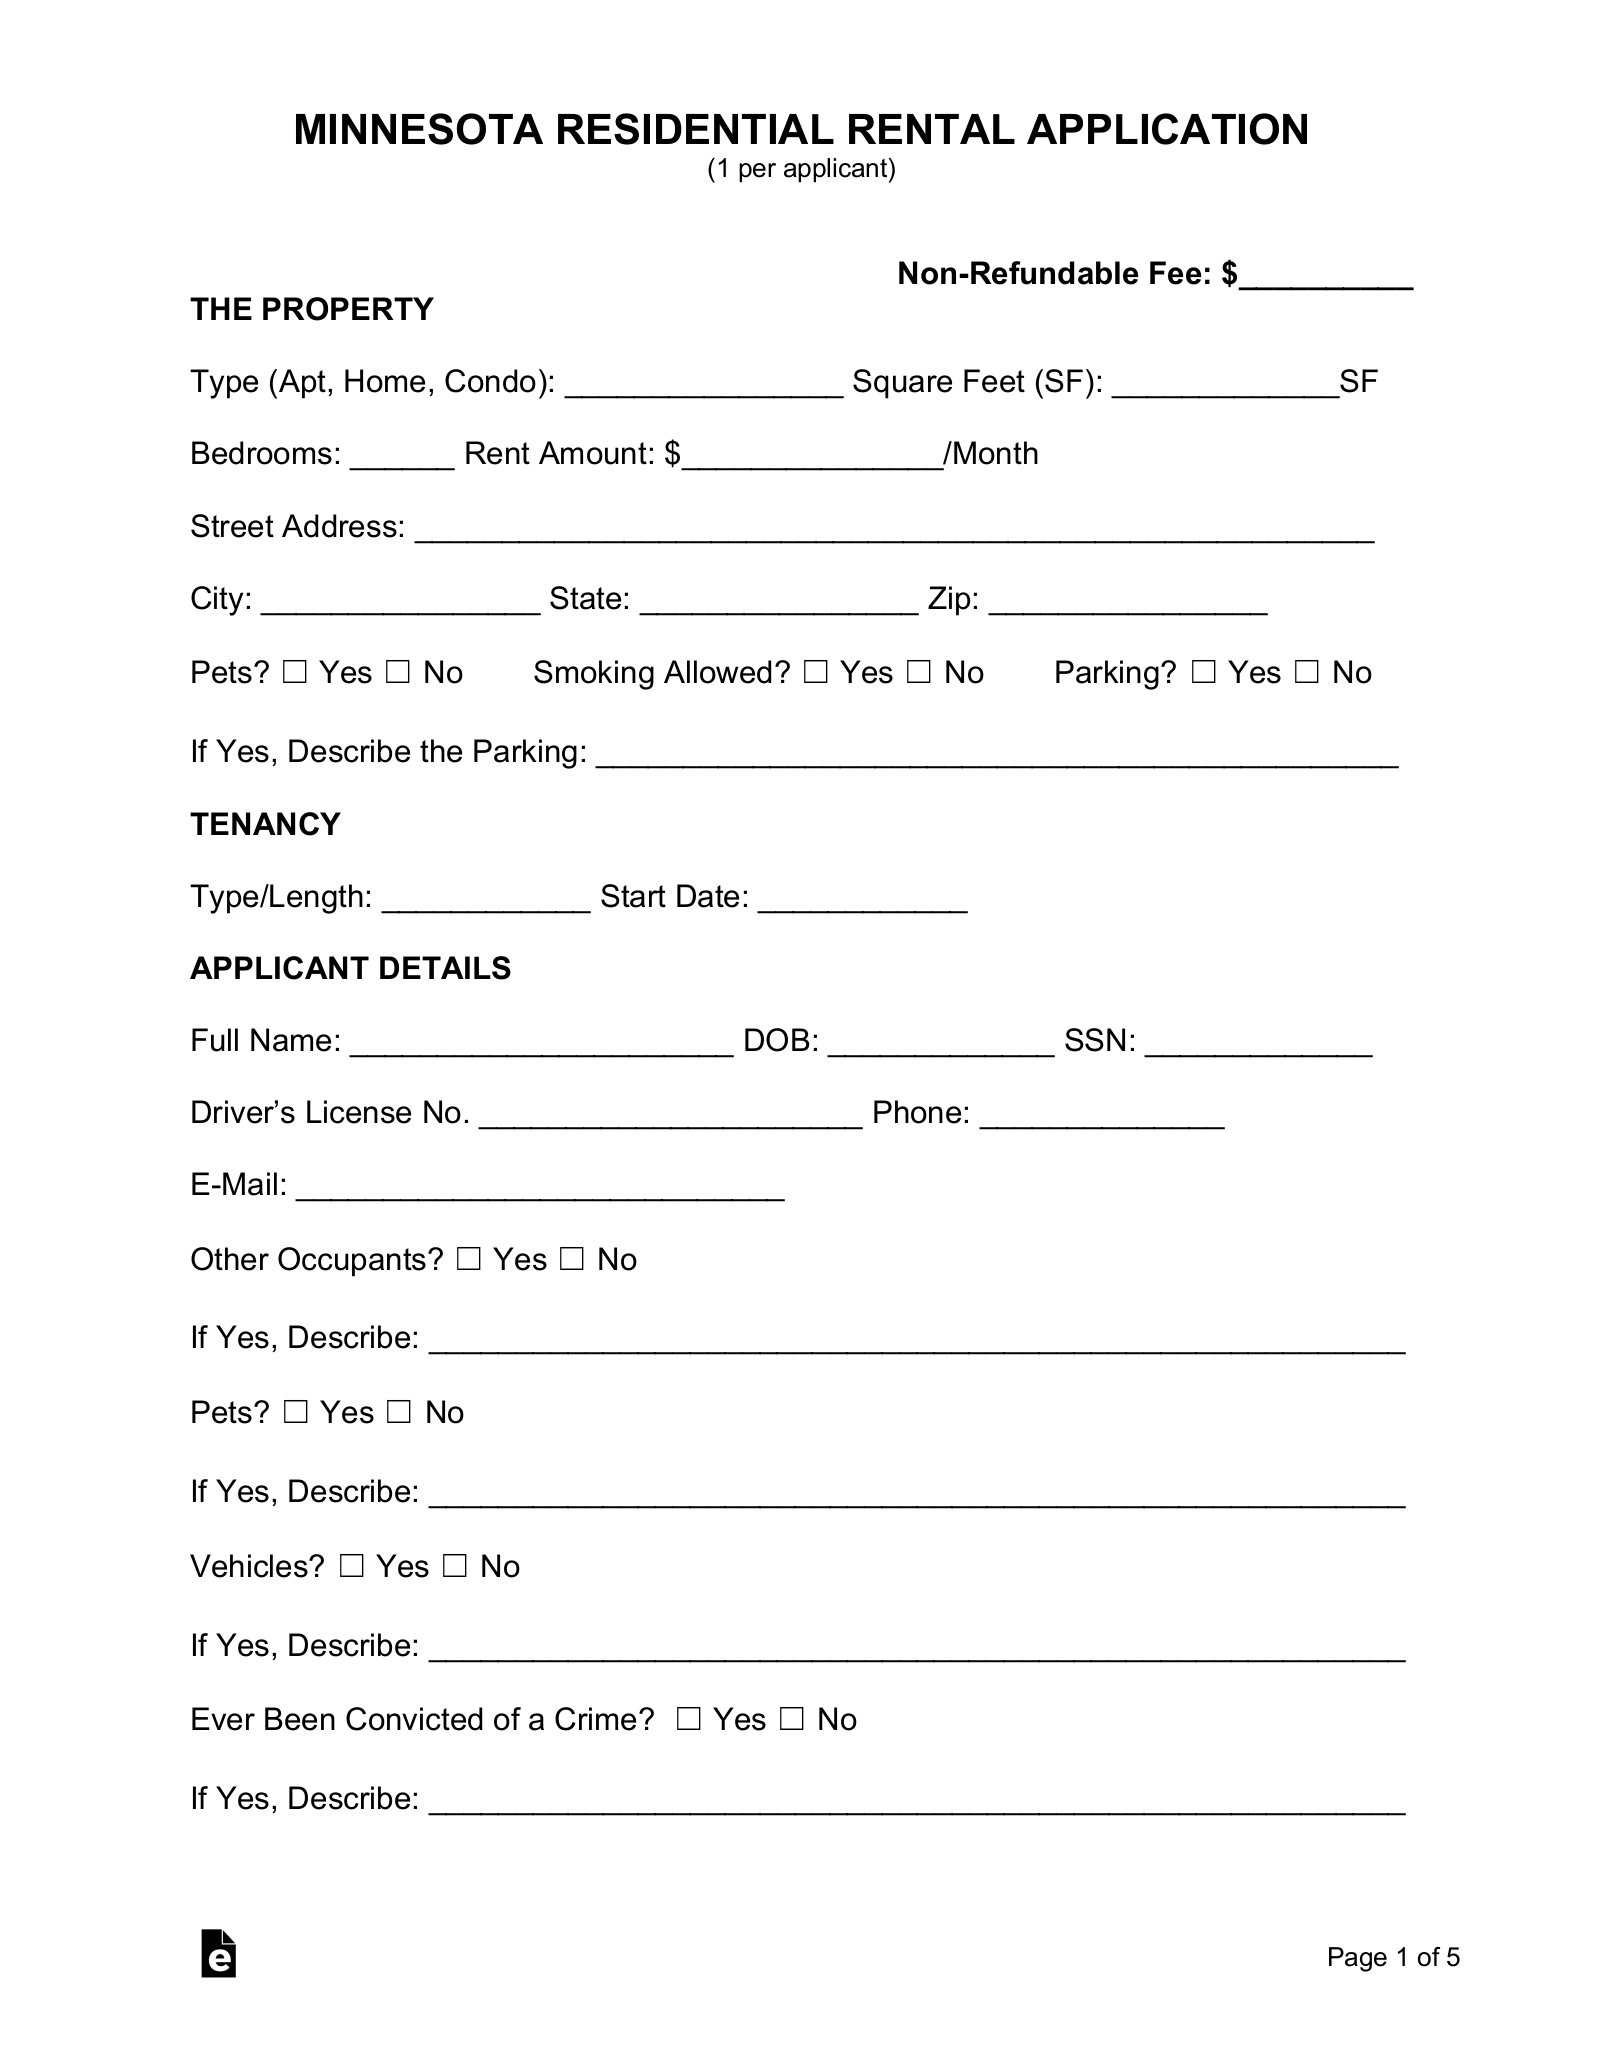 Free Minnesota Rental Application Form Pdf Eforms Free